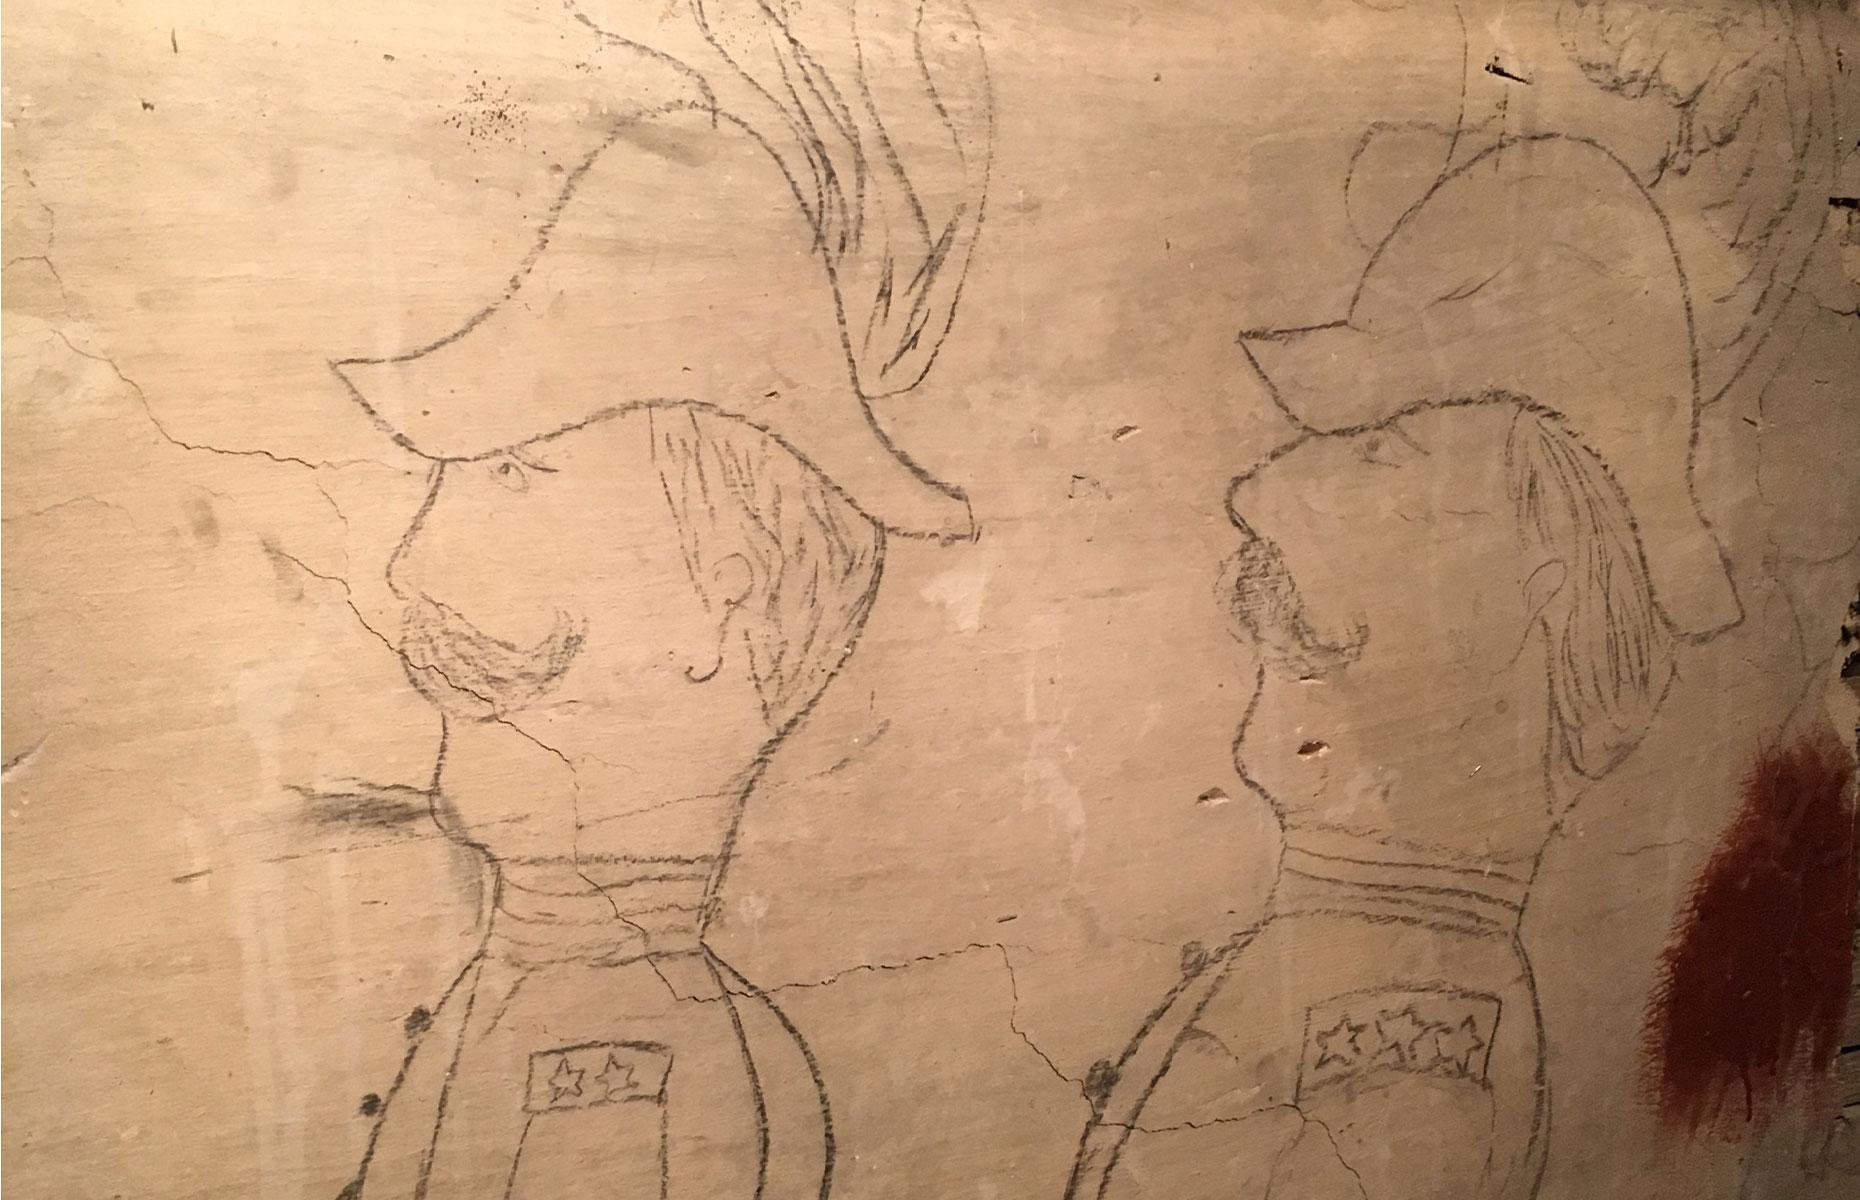 Civil War sketches, Puccini Restaurant, Maryland